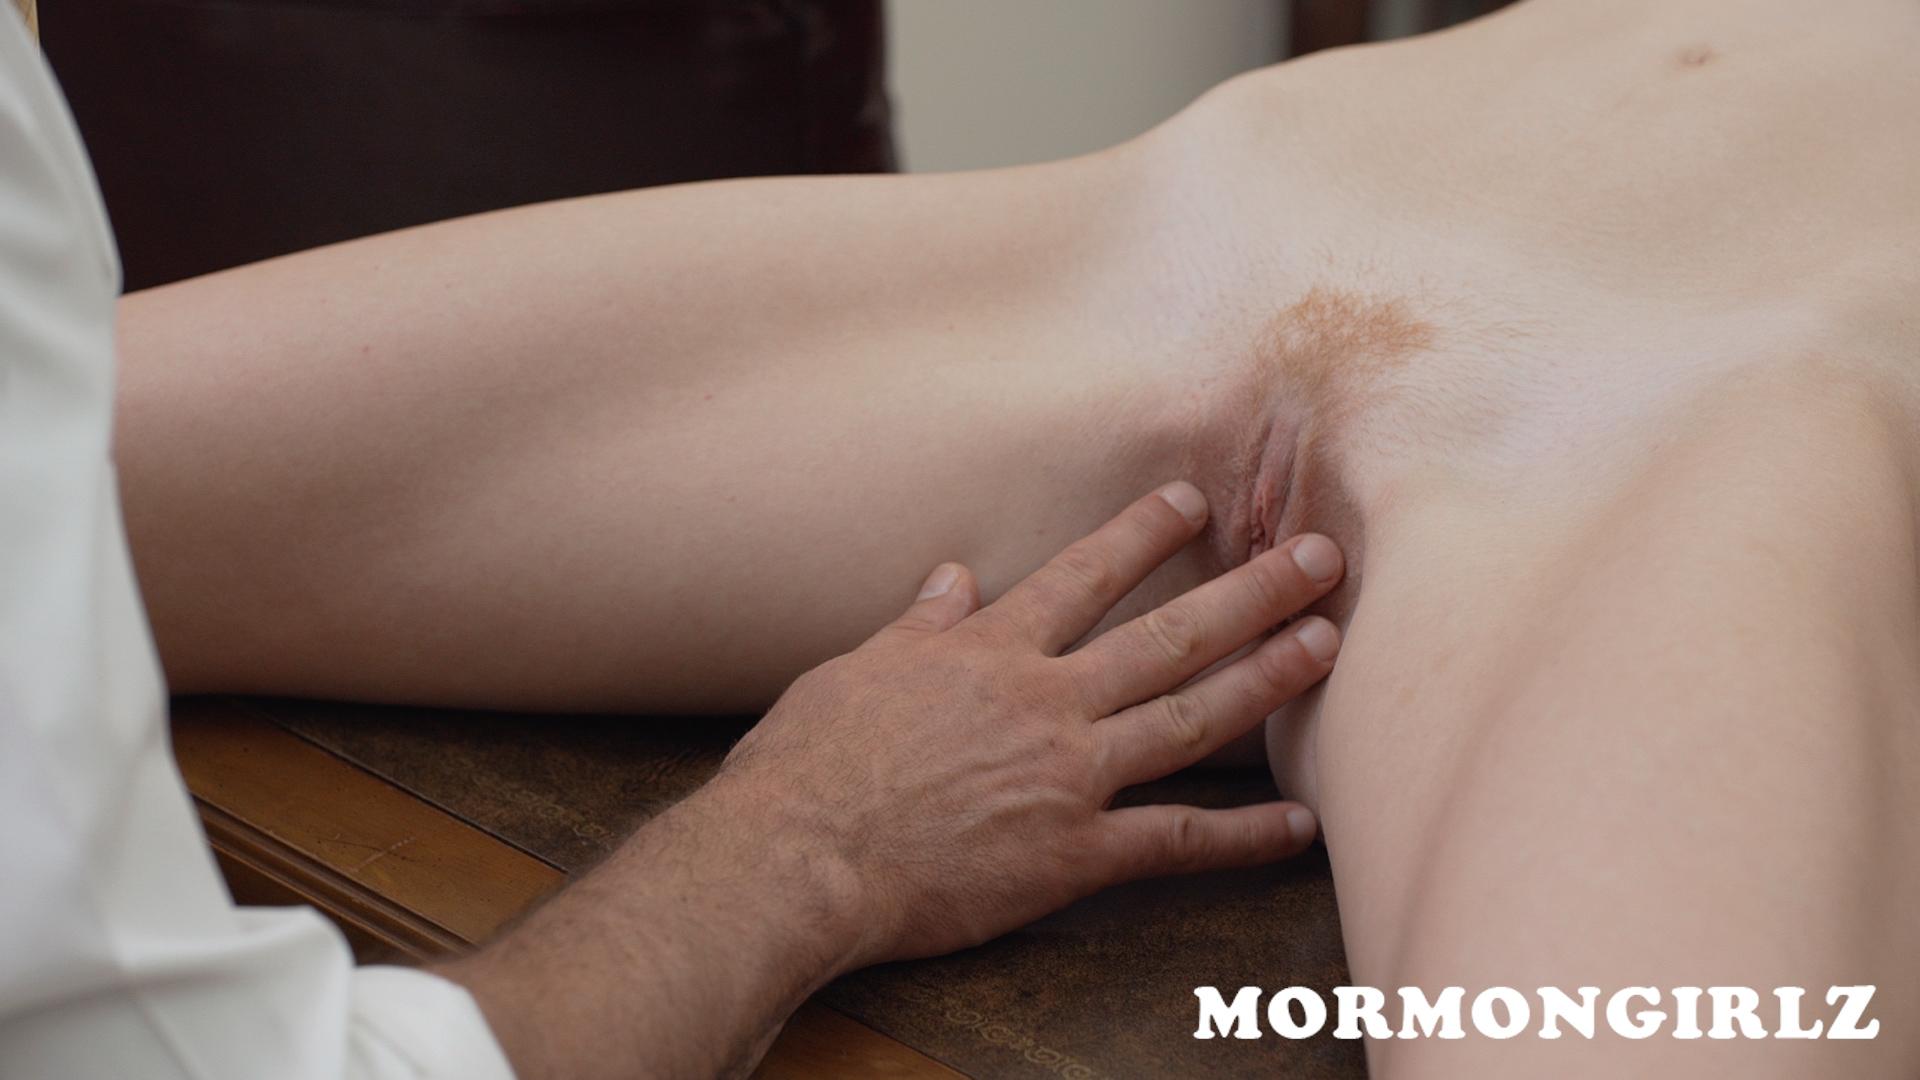 mormongirlz_70b_10